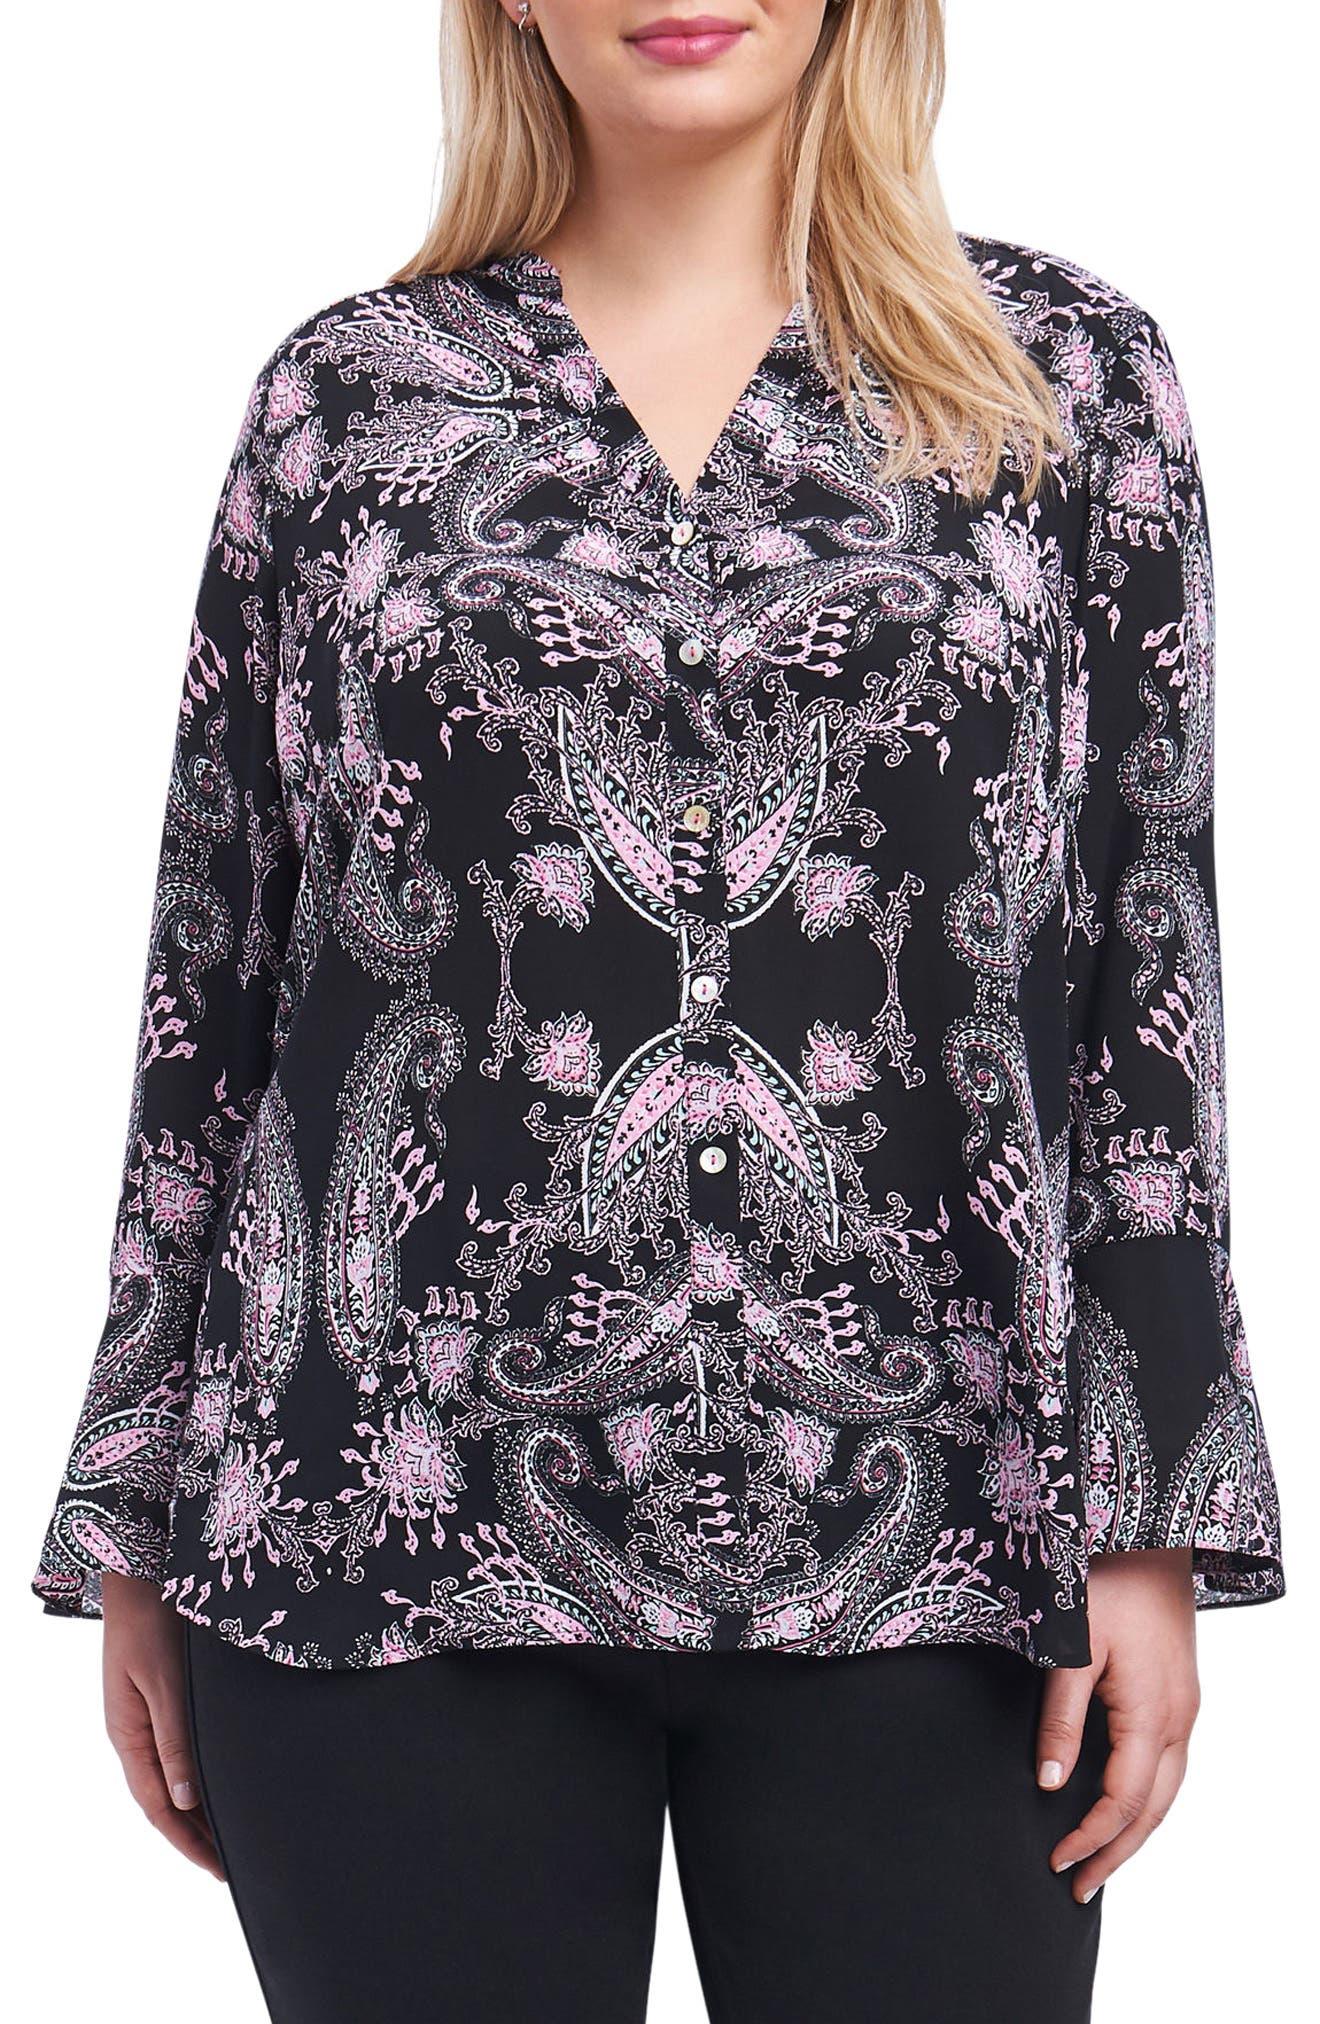 Ali Dolce Vita Bell Sleeve Shirt,                         Main,                         color, Multi